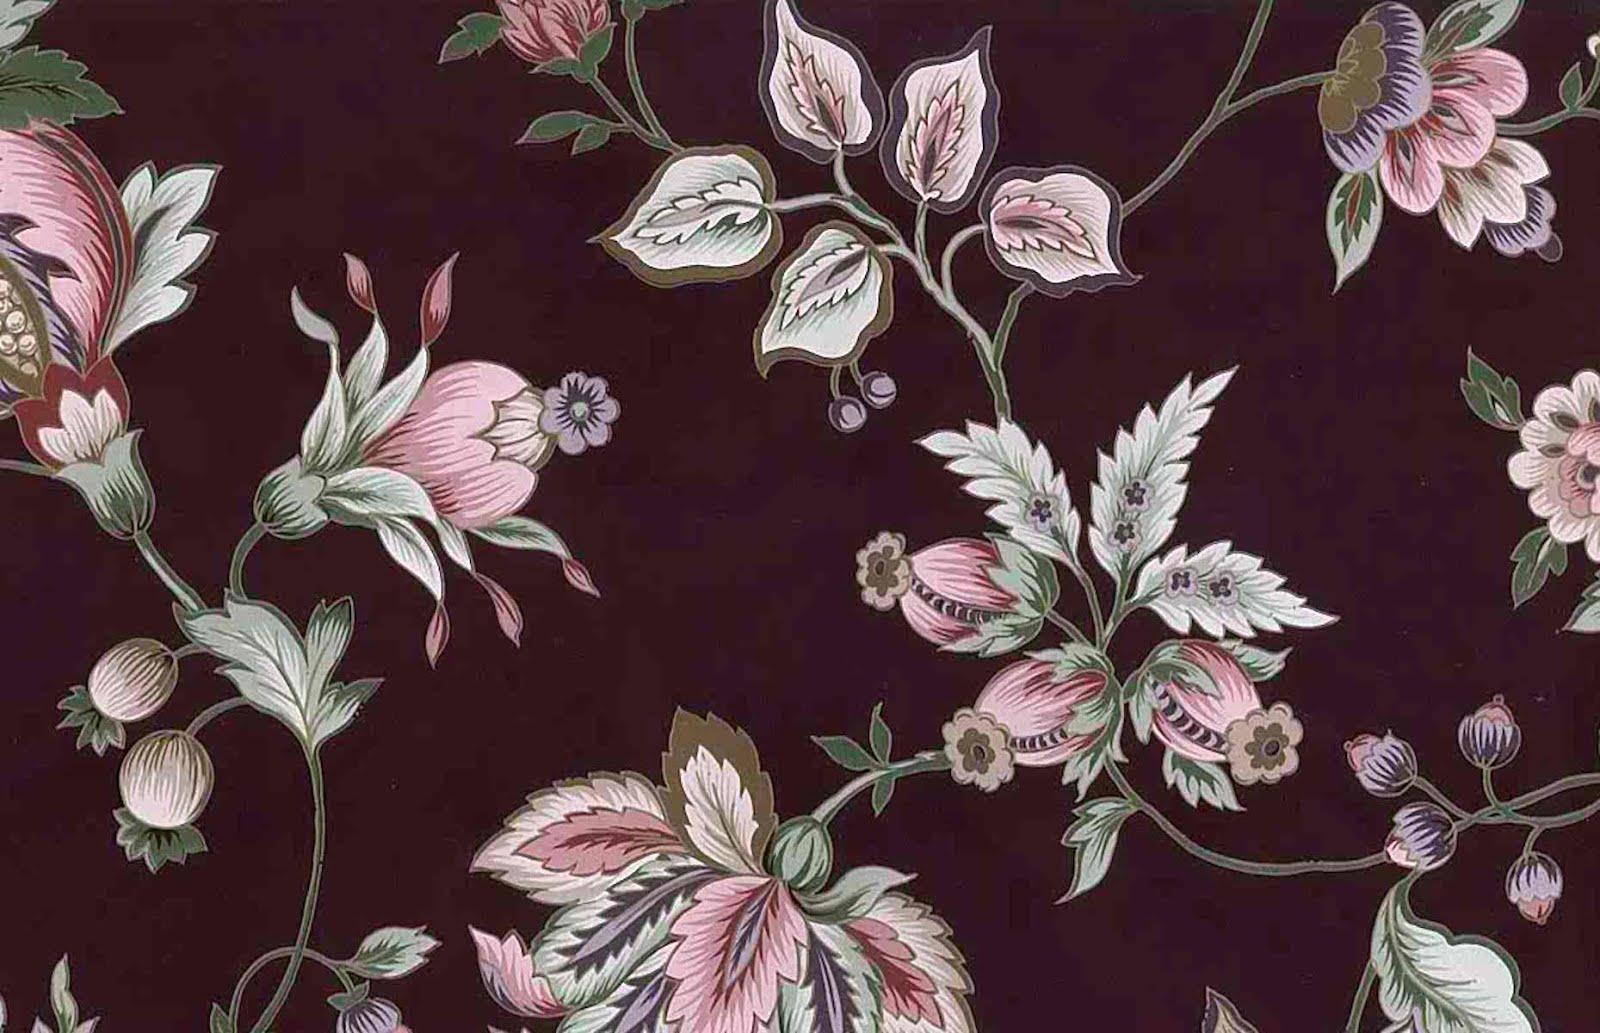 Rose Gold Floral Wallpaper Hd Backgrounds Download